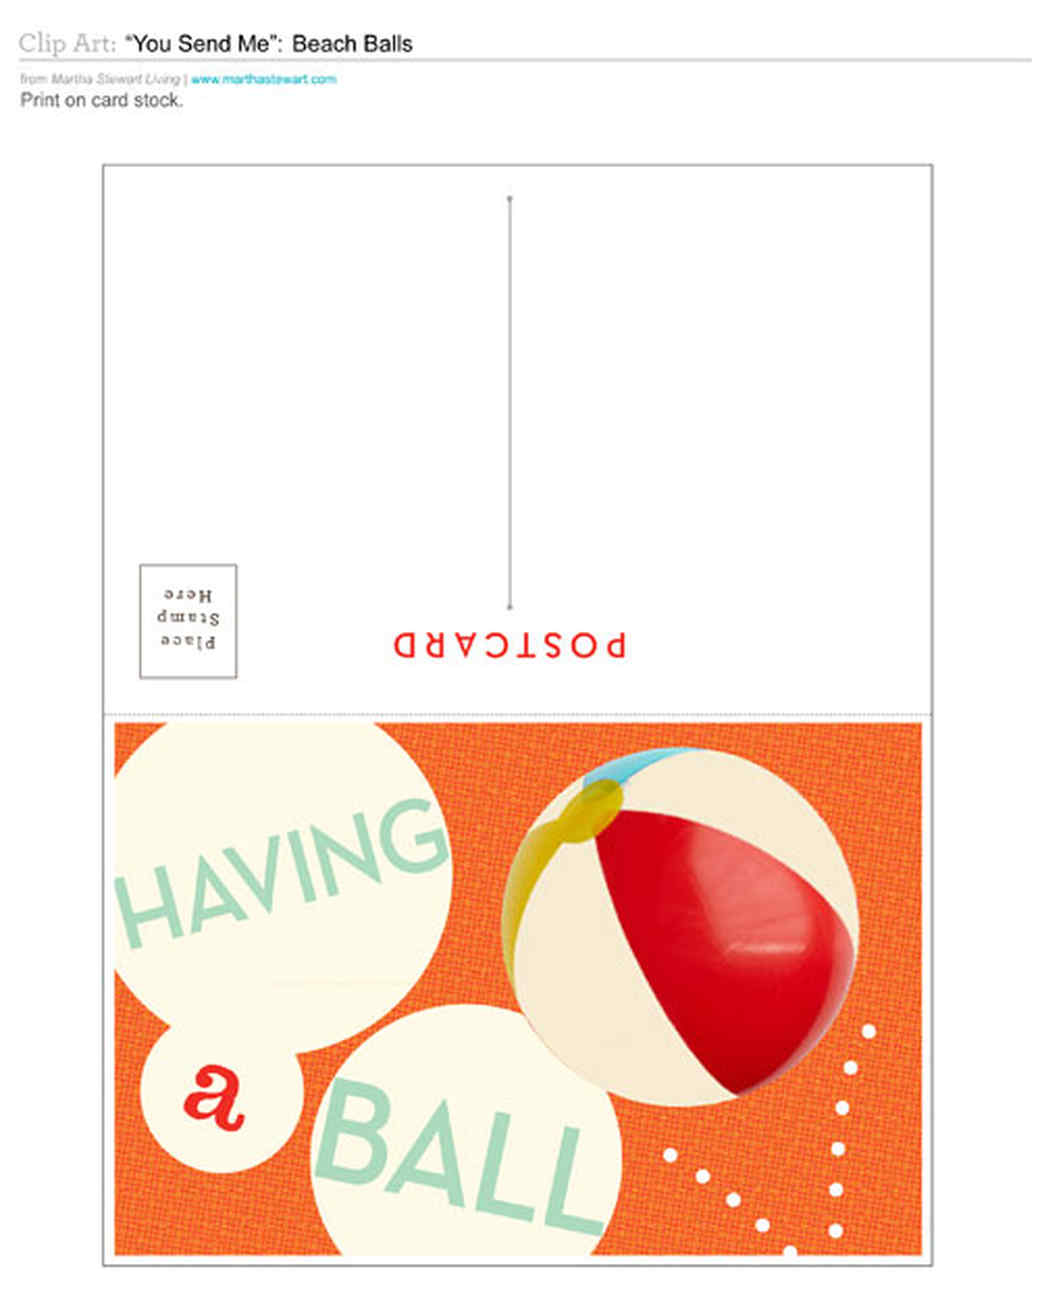 poastcards-ball-0811mld107292.jpg